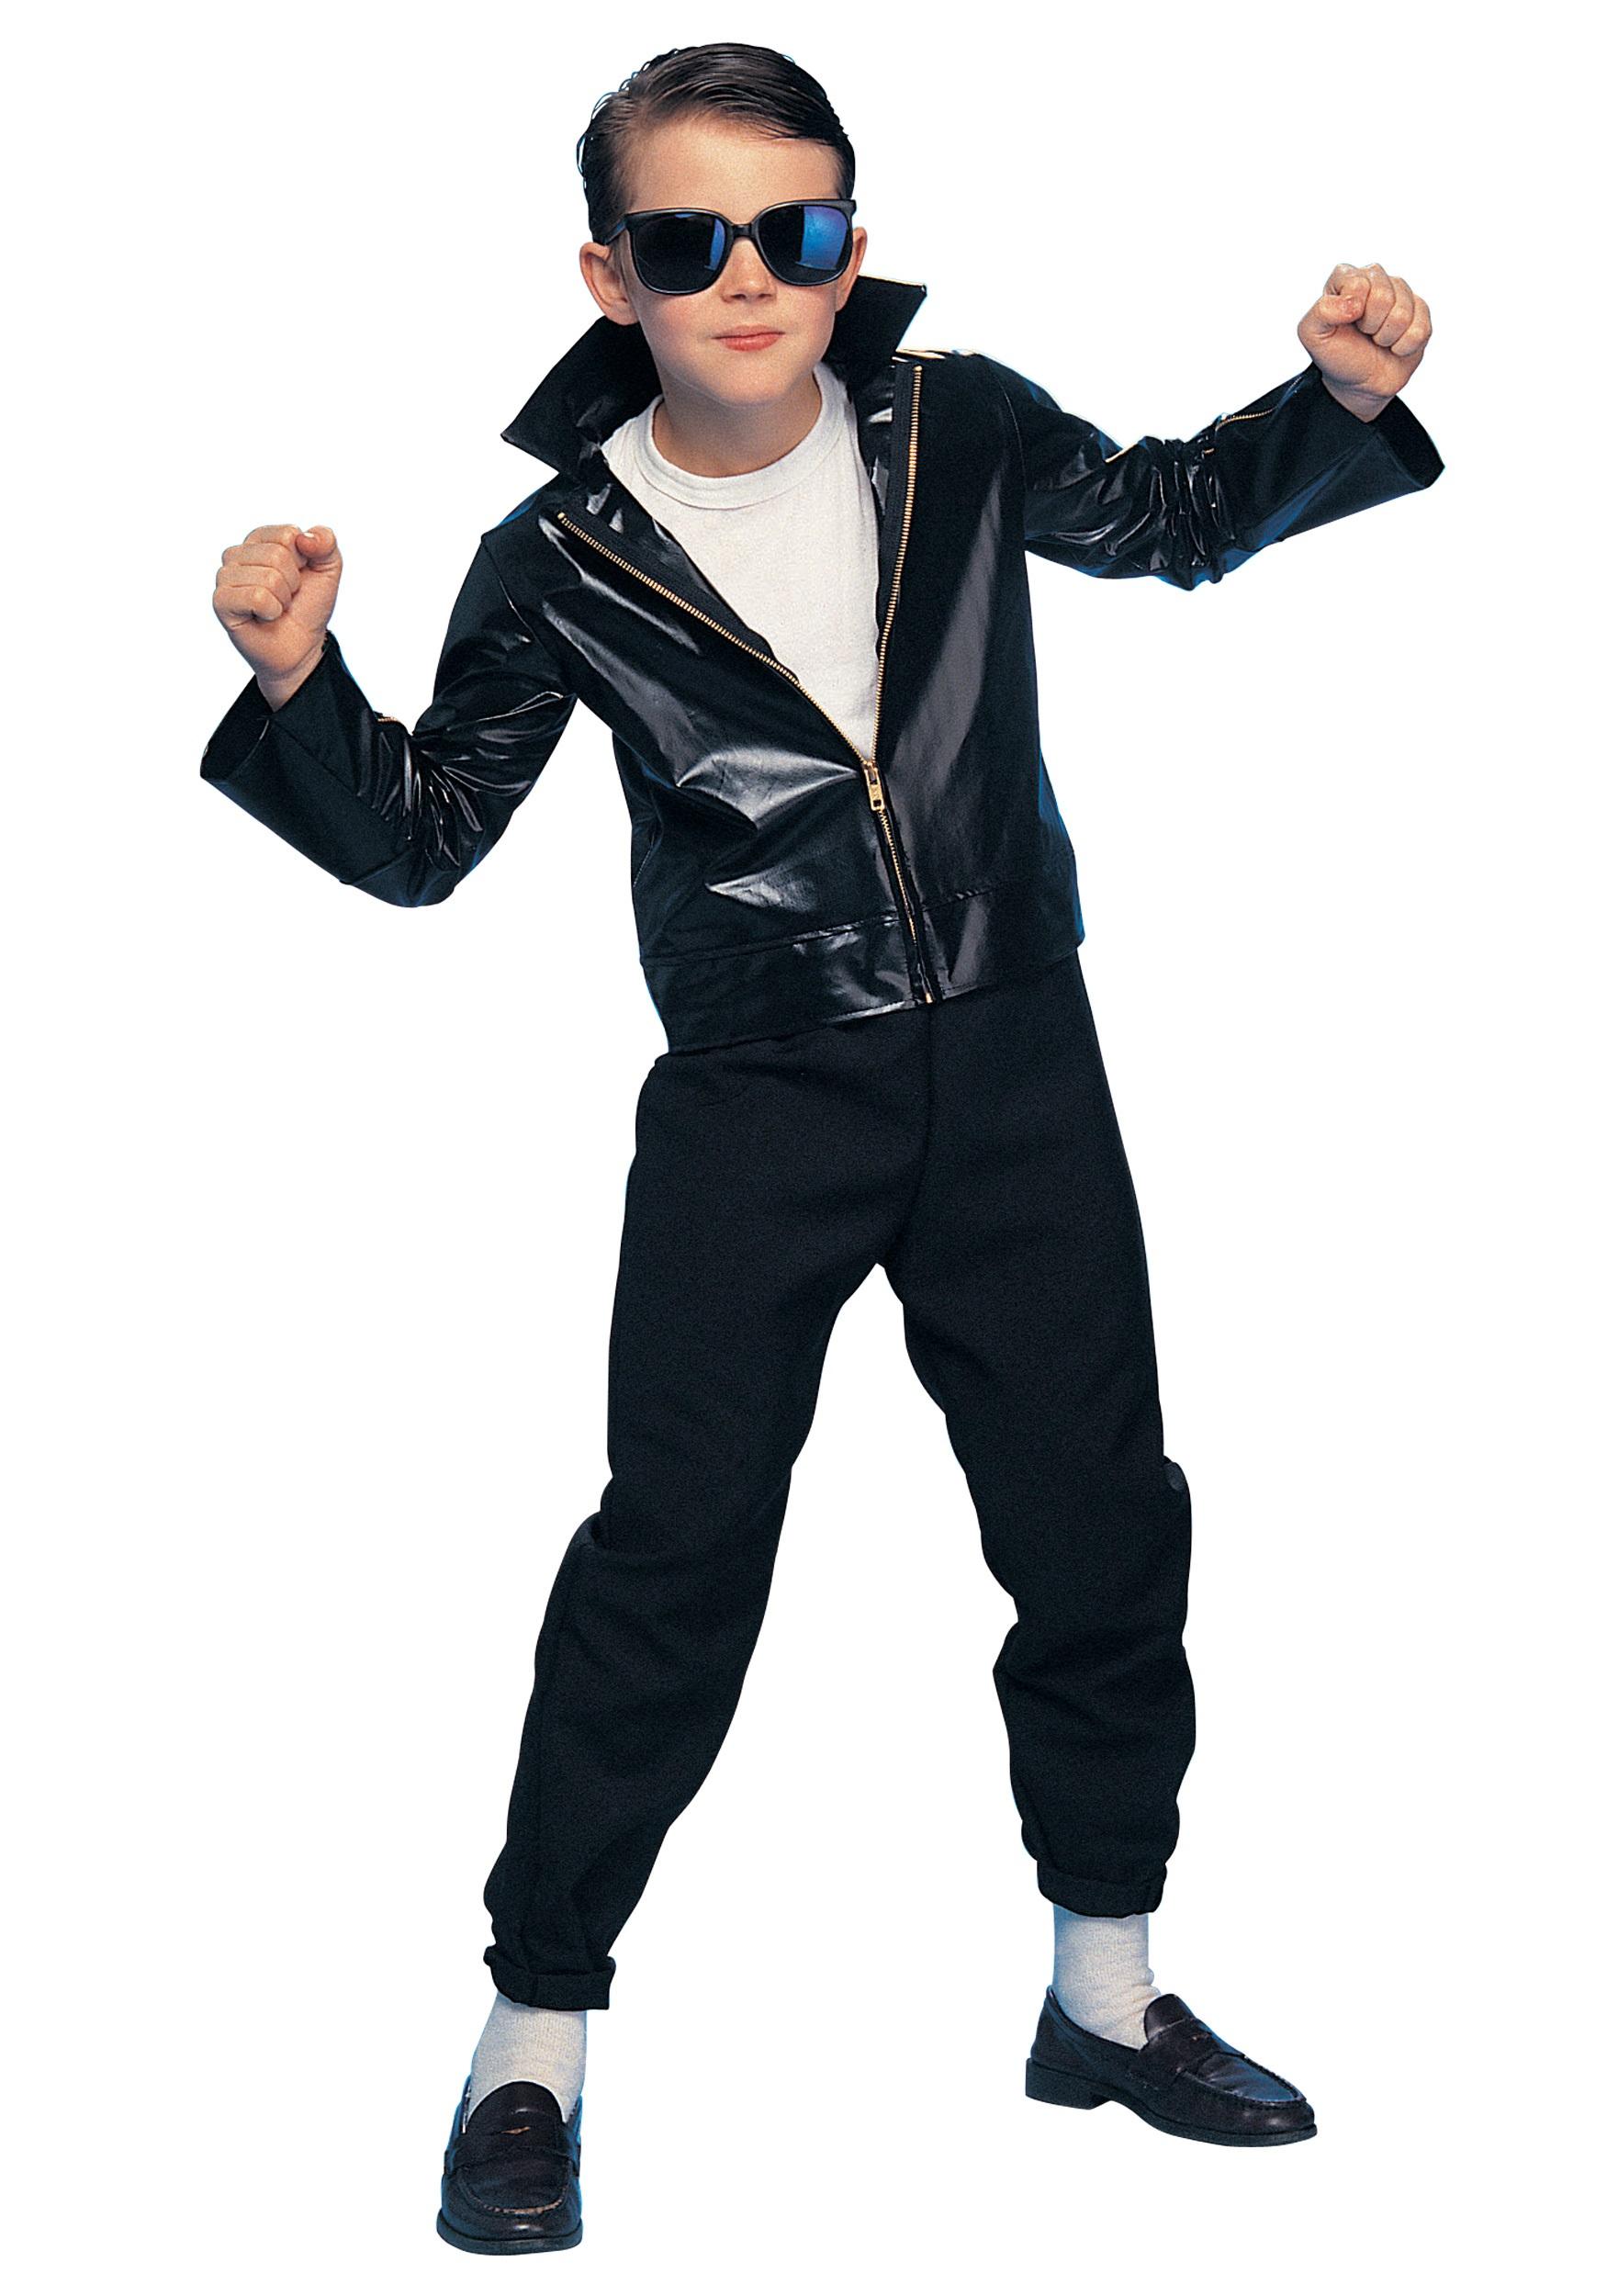 Kids Greaser Costume  sc 1 st  Halloween Costumes & Kids Greaser Costume - Halloween Costumes